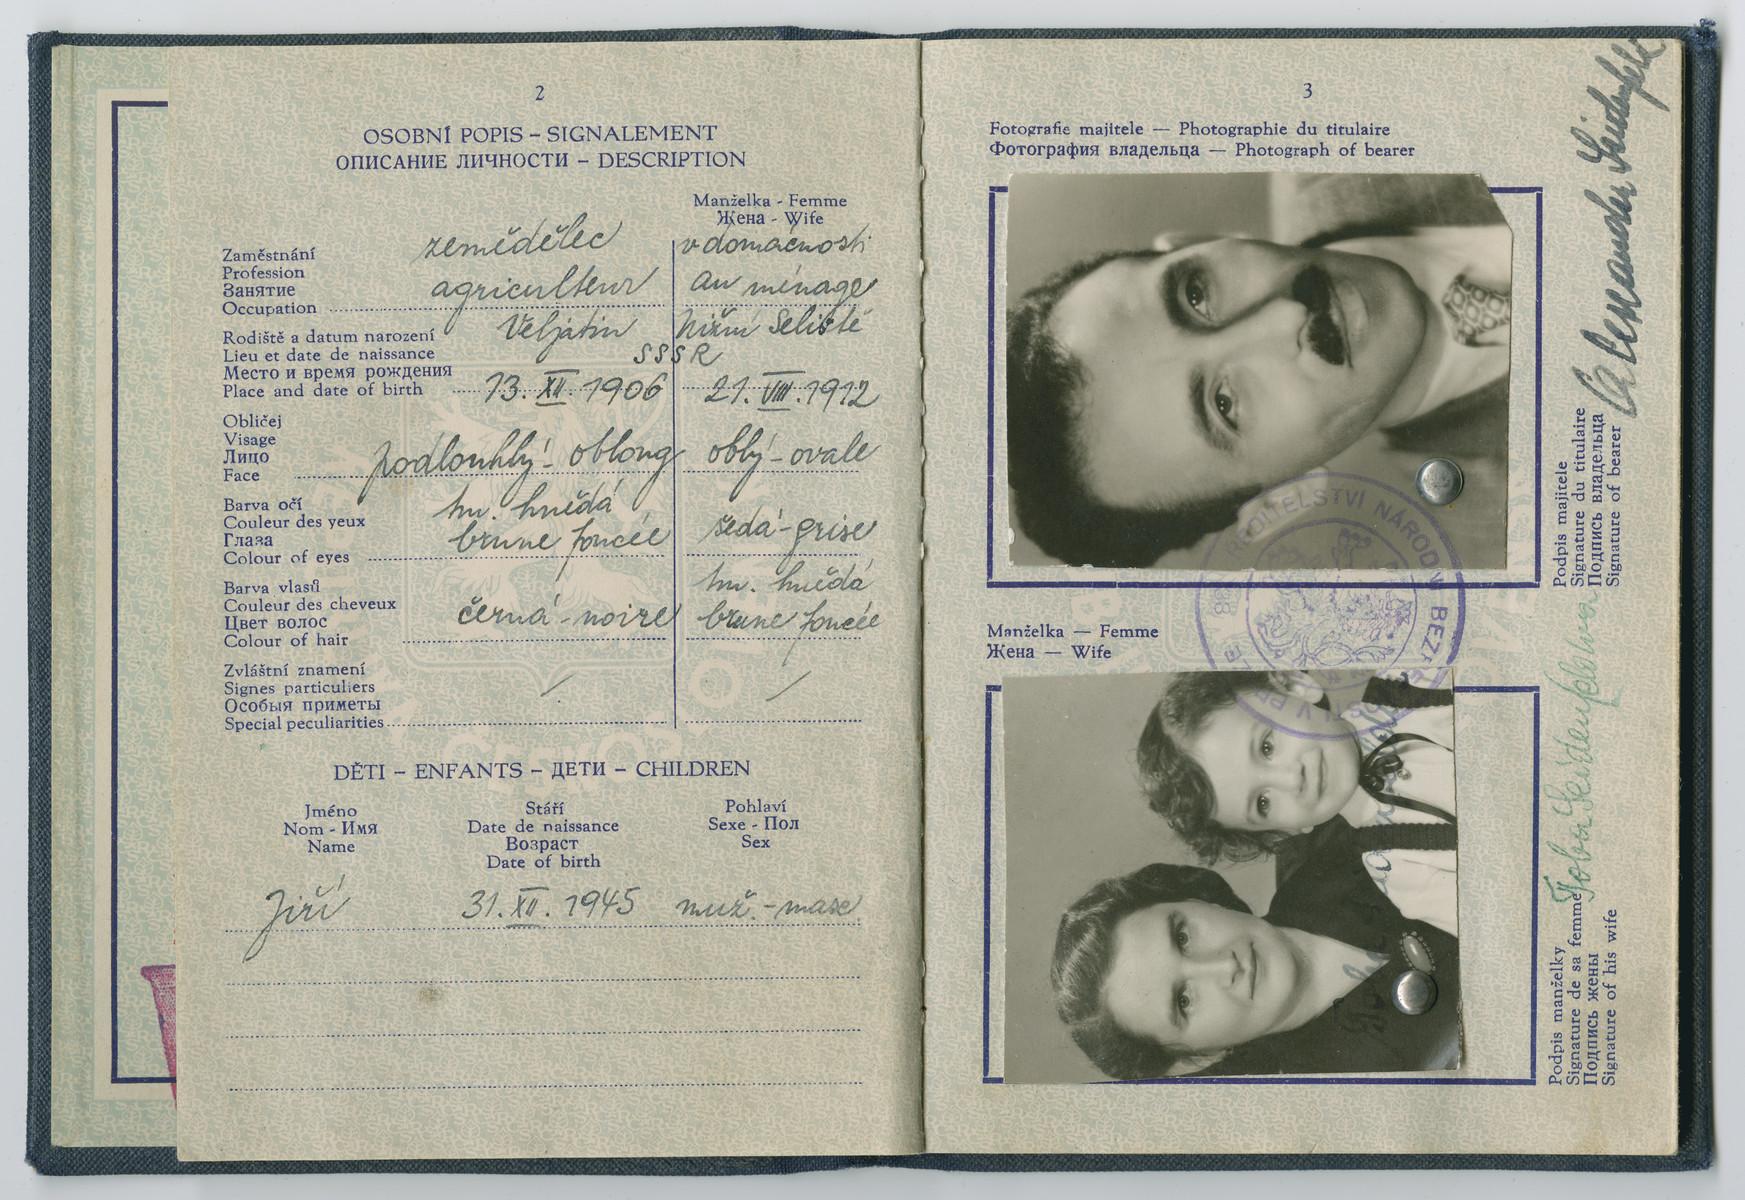 Interior of a Czech family passport belonging to Alexander (Sandor), Toba (Ilona), and Jiri Seidenfeld.